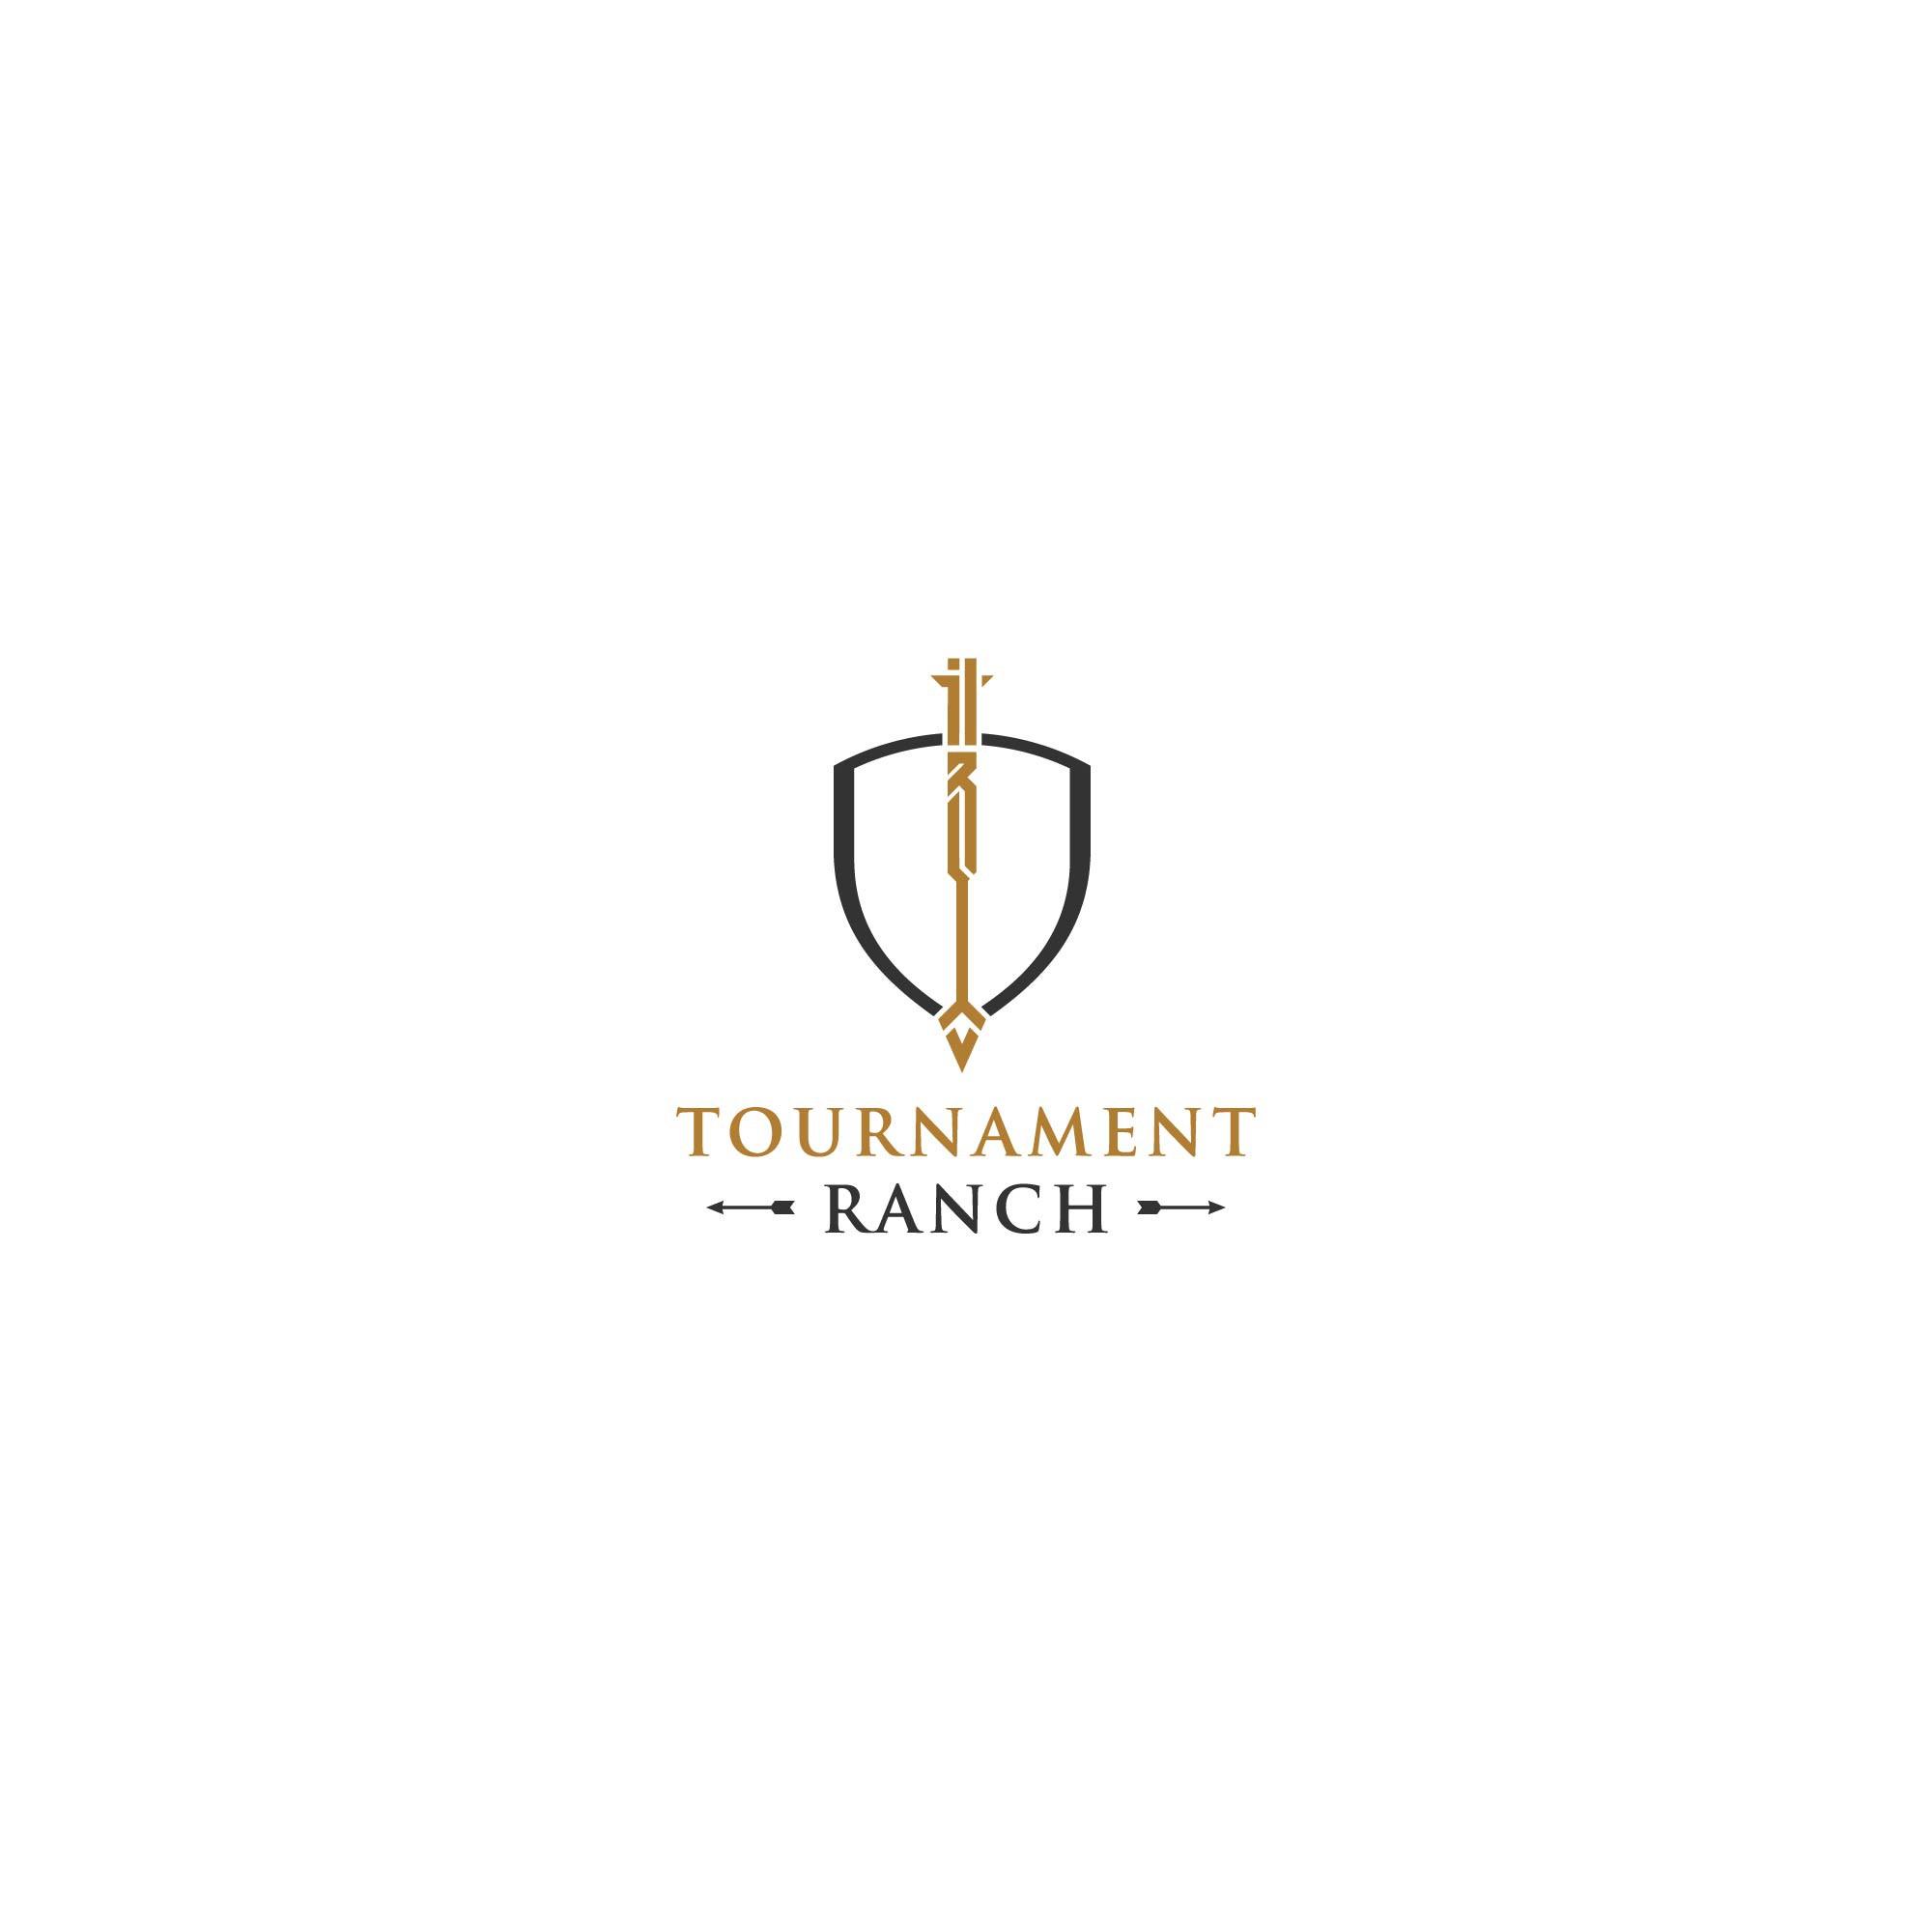 Tournament Ranch